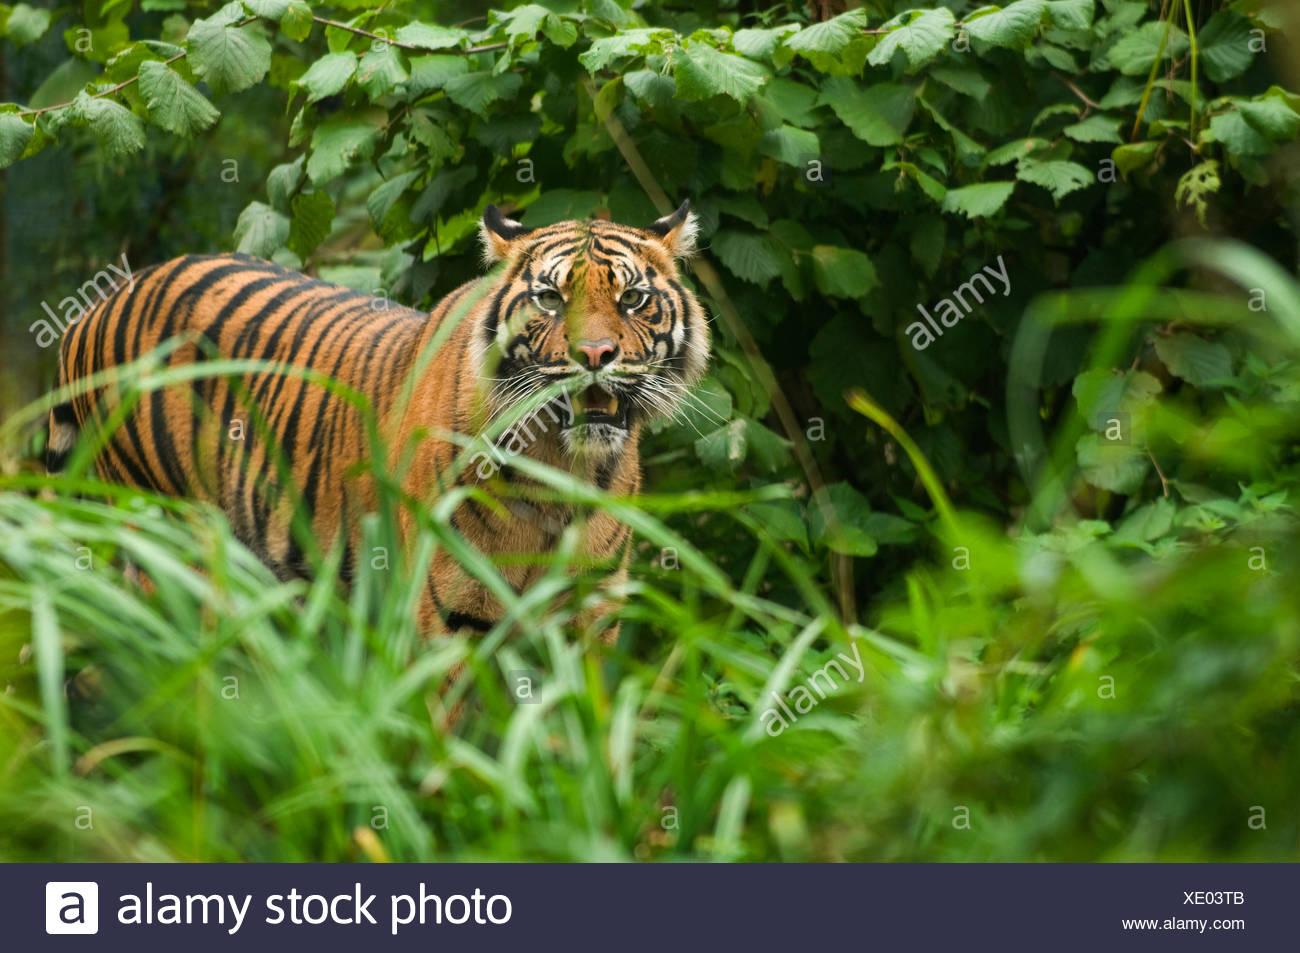 Sumatran tiger (Panthera tigris sumatrae) standing in long grass, snarling, captive. - Stock Image